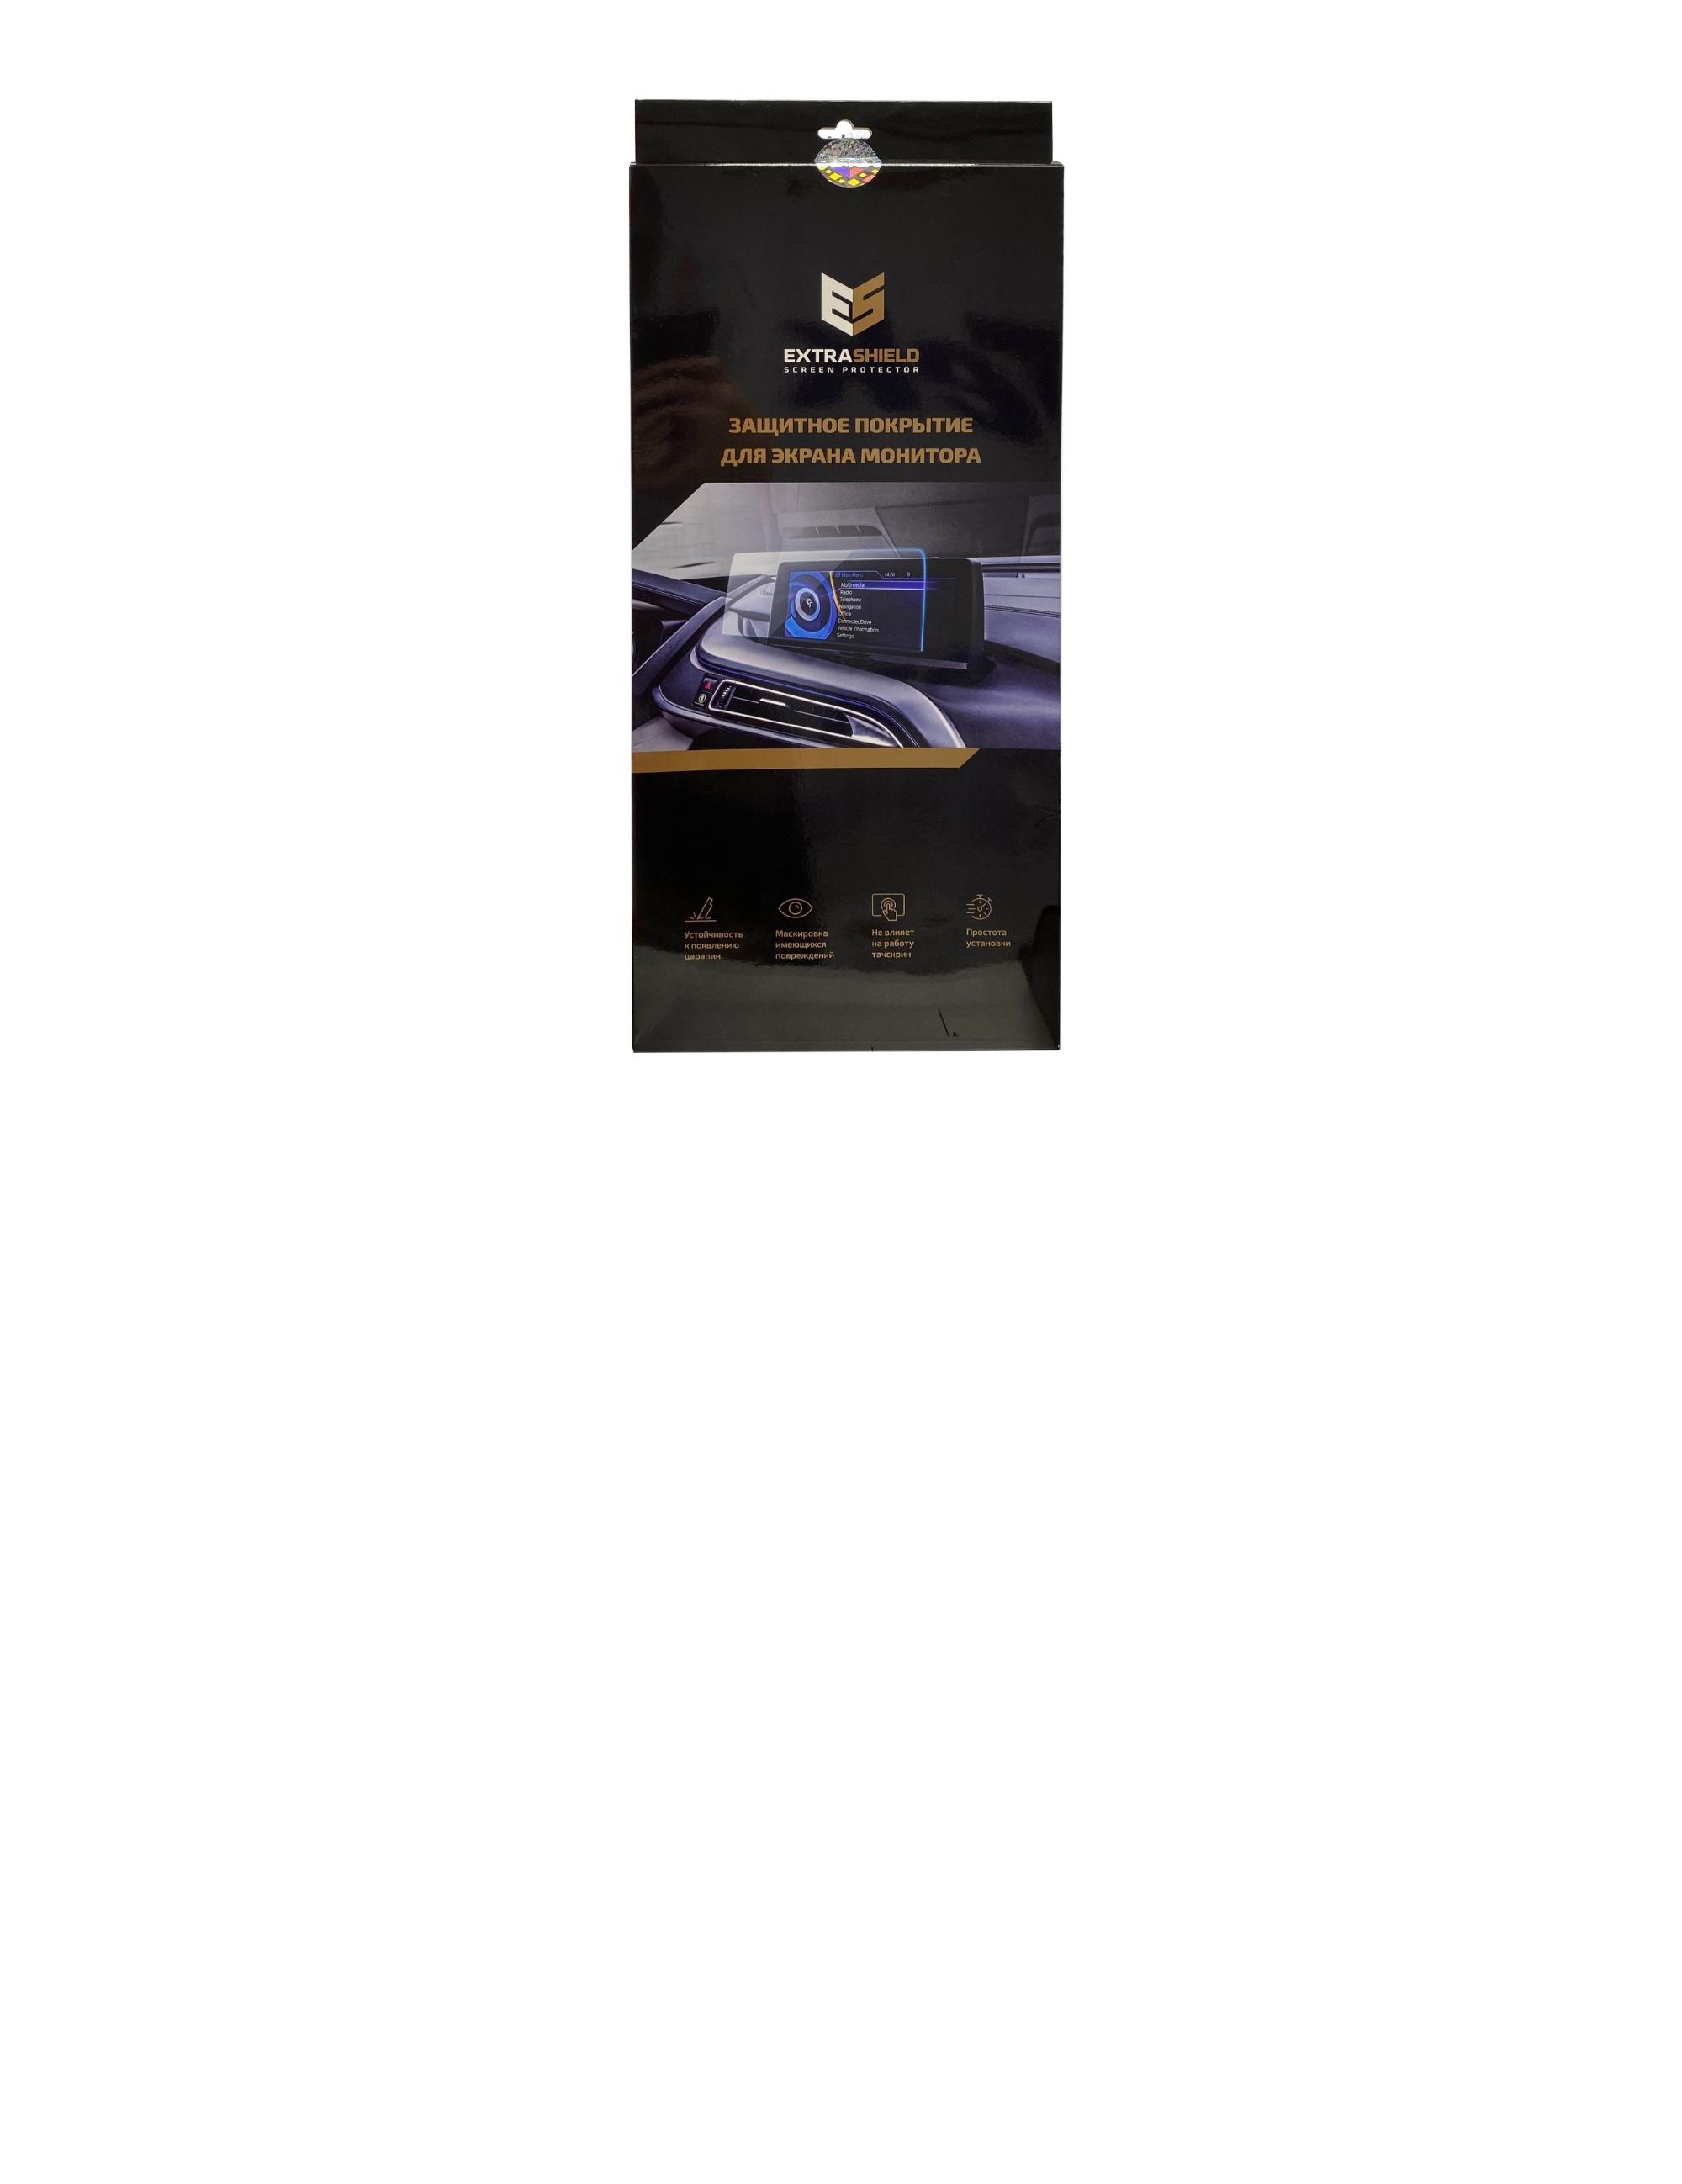 Aston Martin Vantage 2017 - н.в. мультимедиа 12 Статическая пленка Глянец